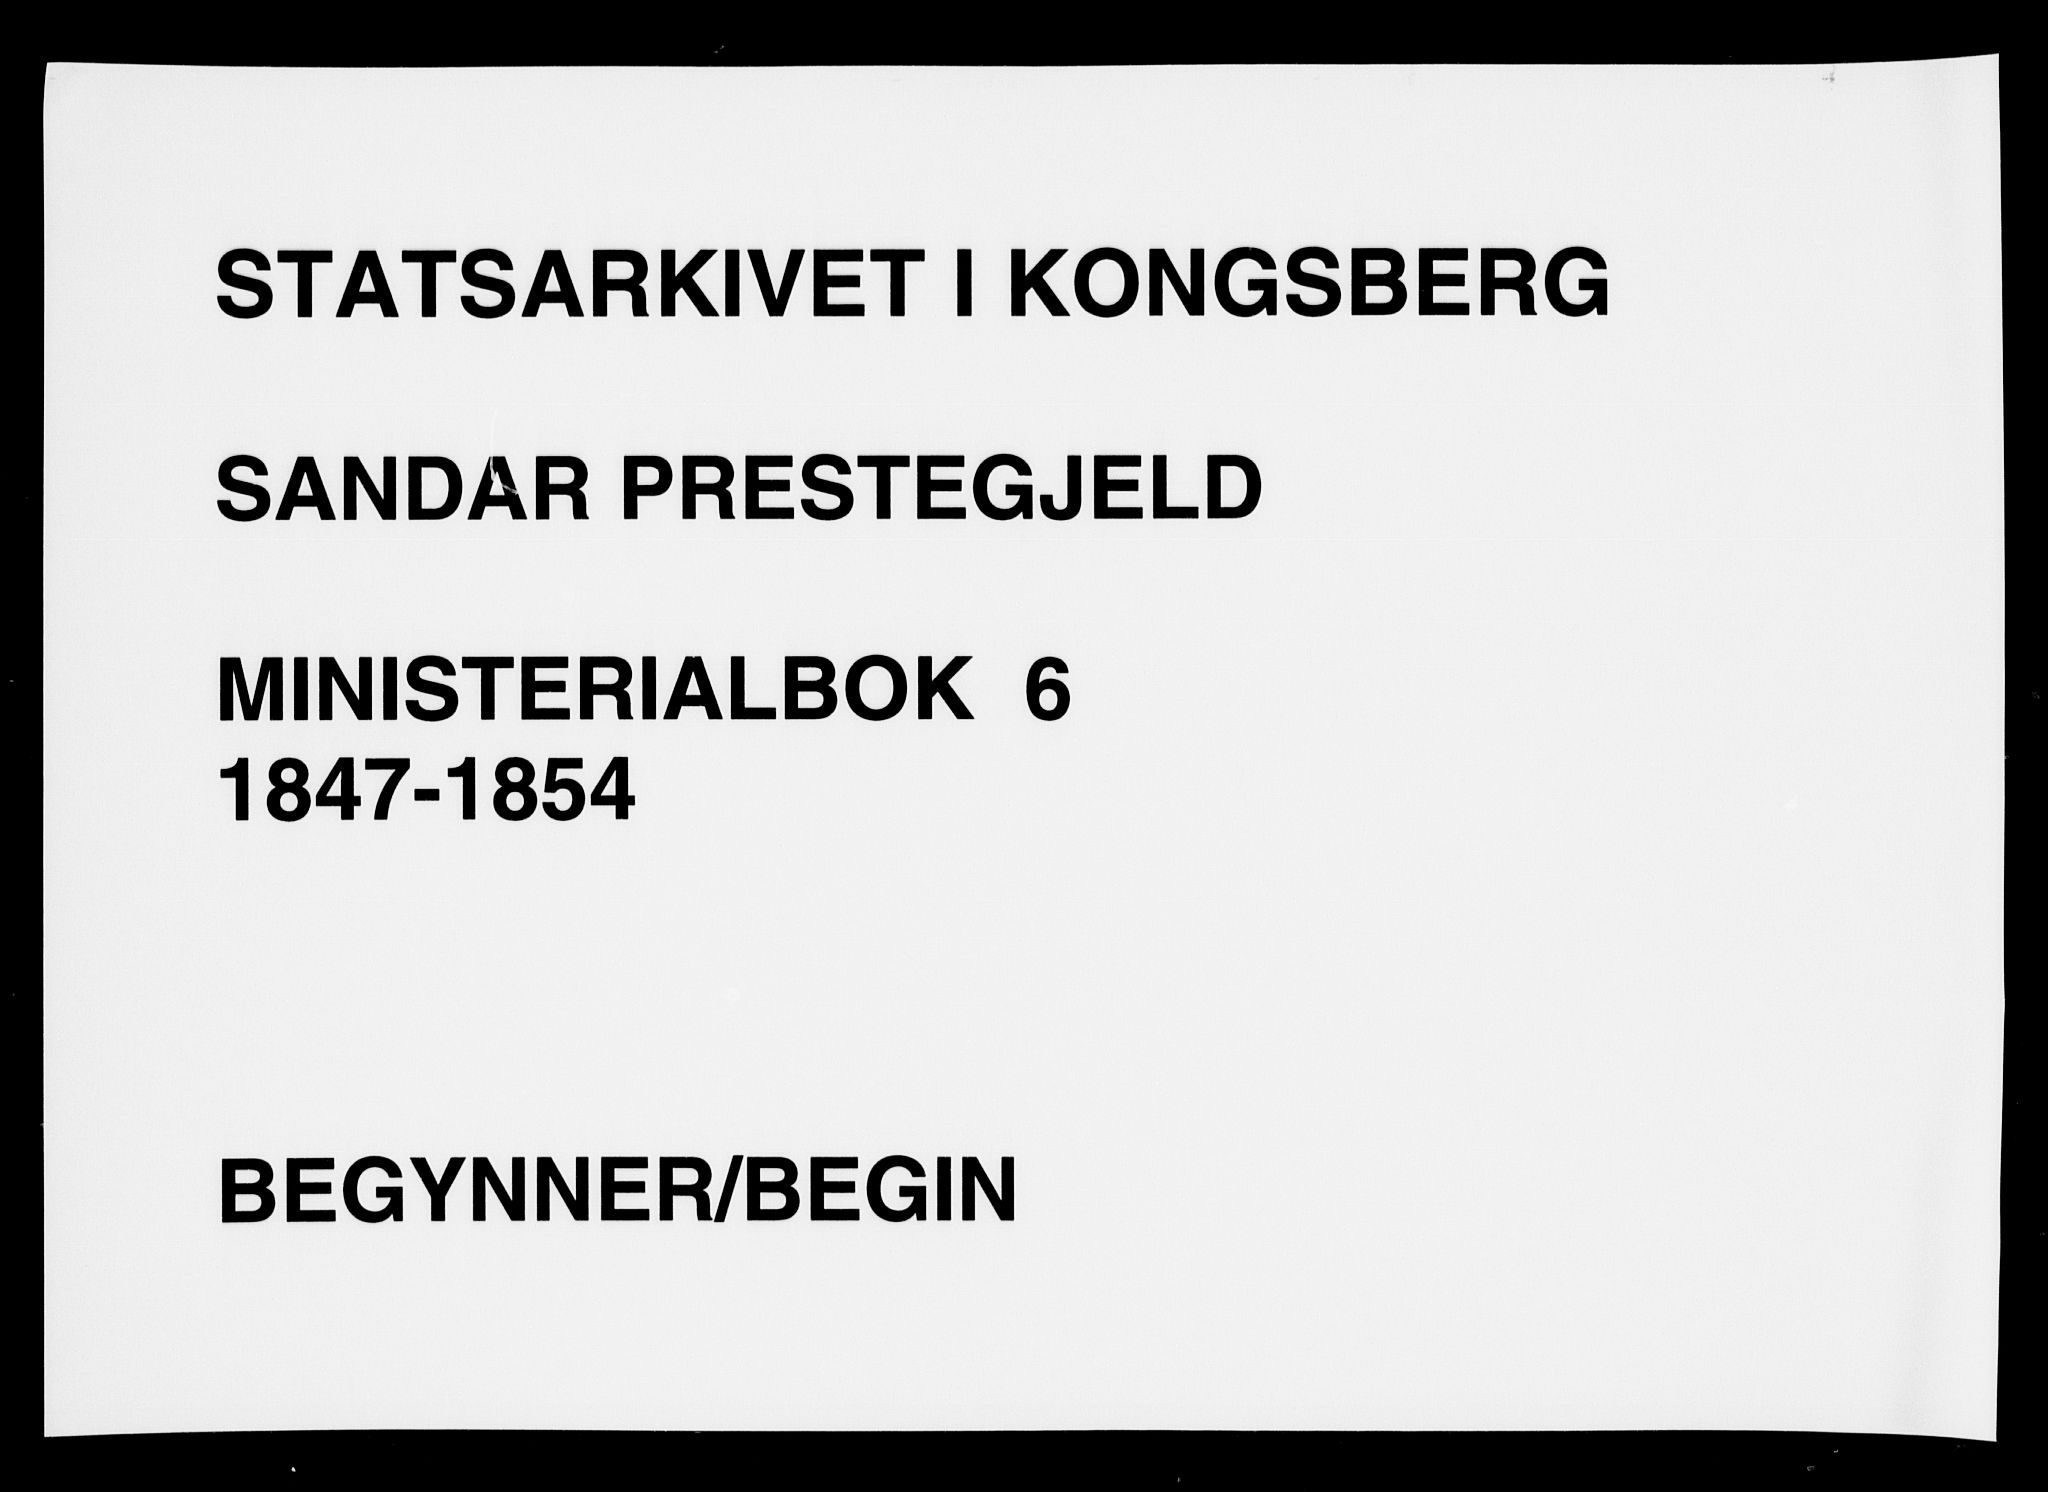 SAKO, Sandar kirkebøker, F/Fa/L0006: Ministerialbok nr. 6, 1847-1860